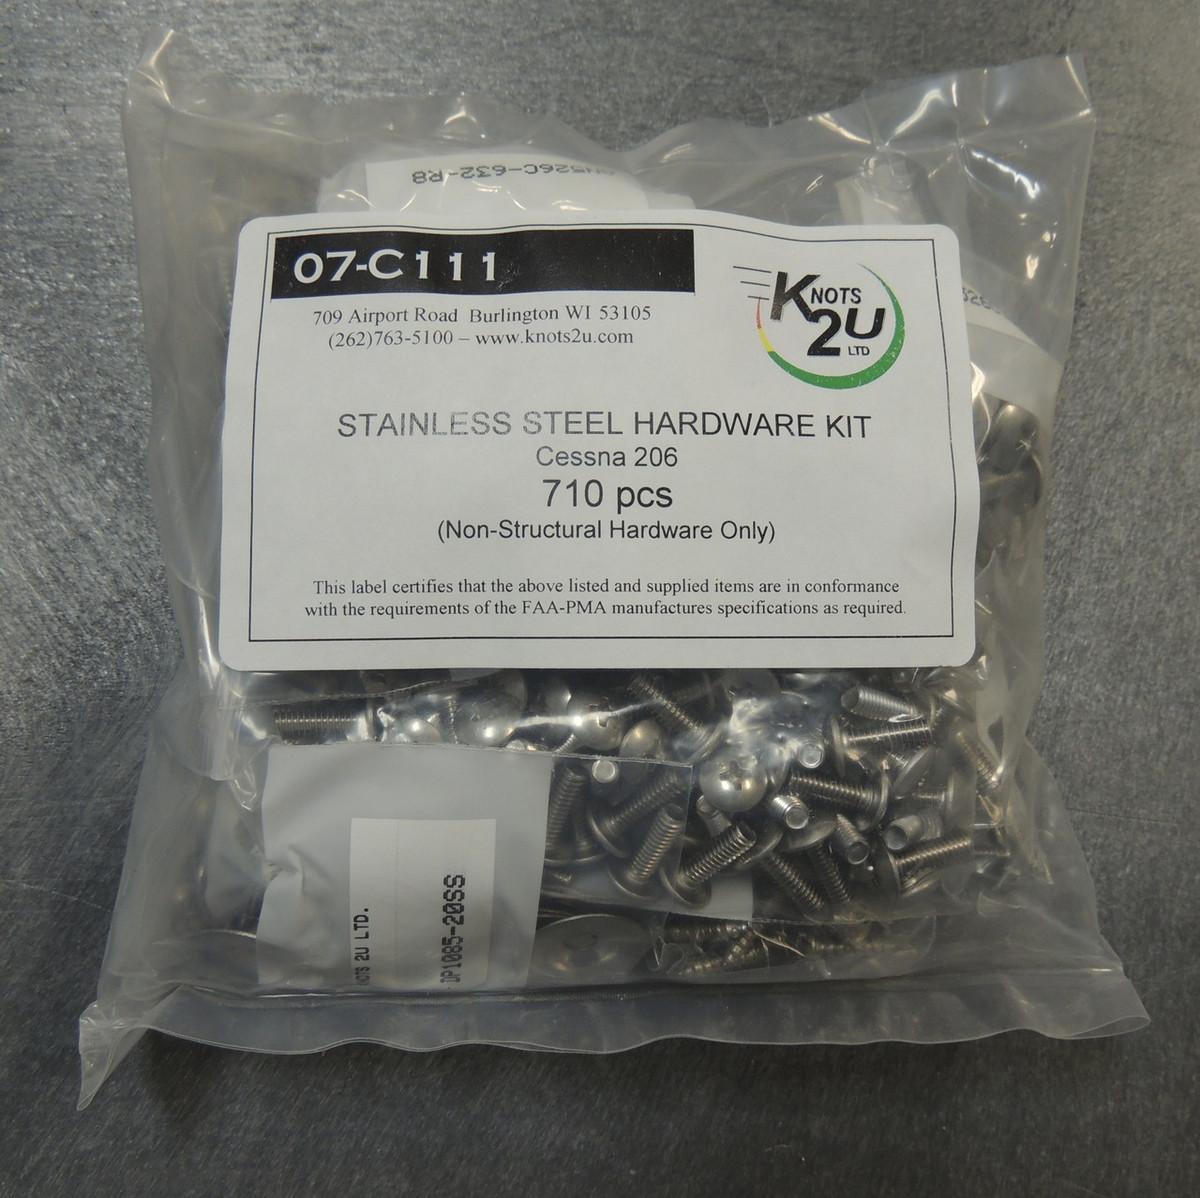 710 Pcs. Cessna 206 Stainless Steel Hardware Kit